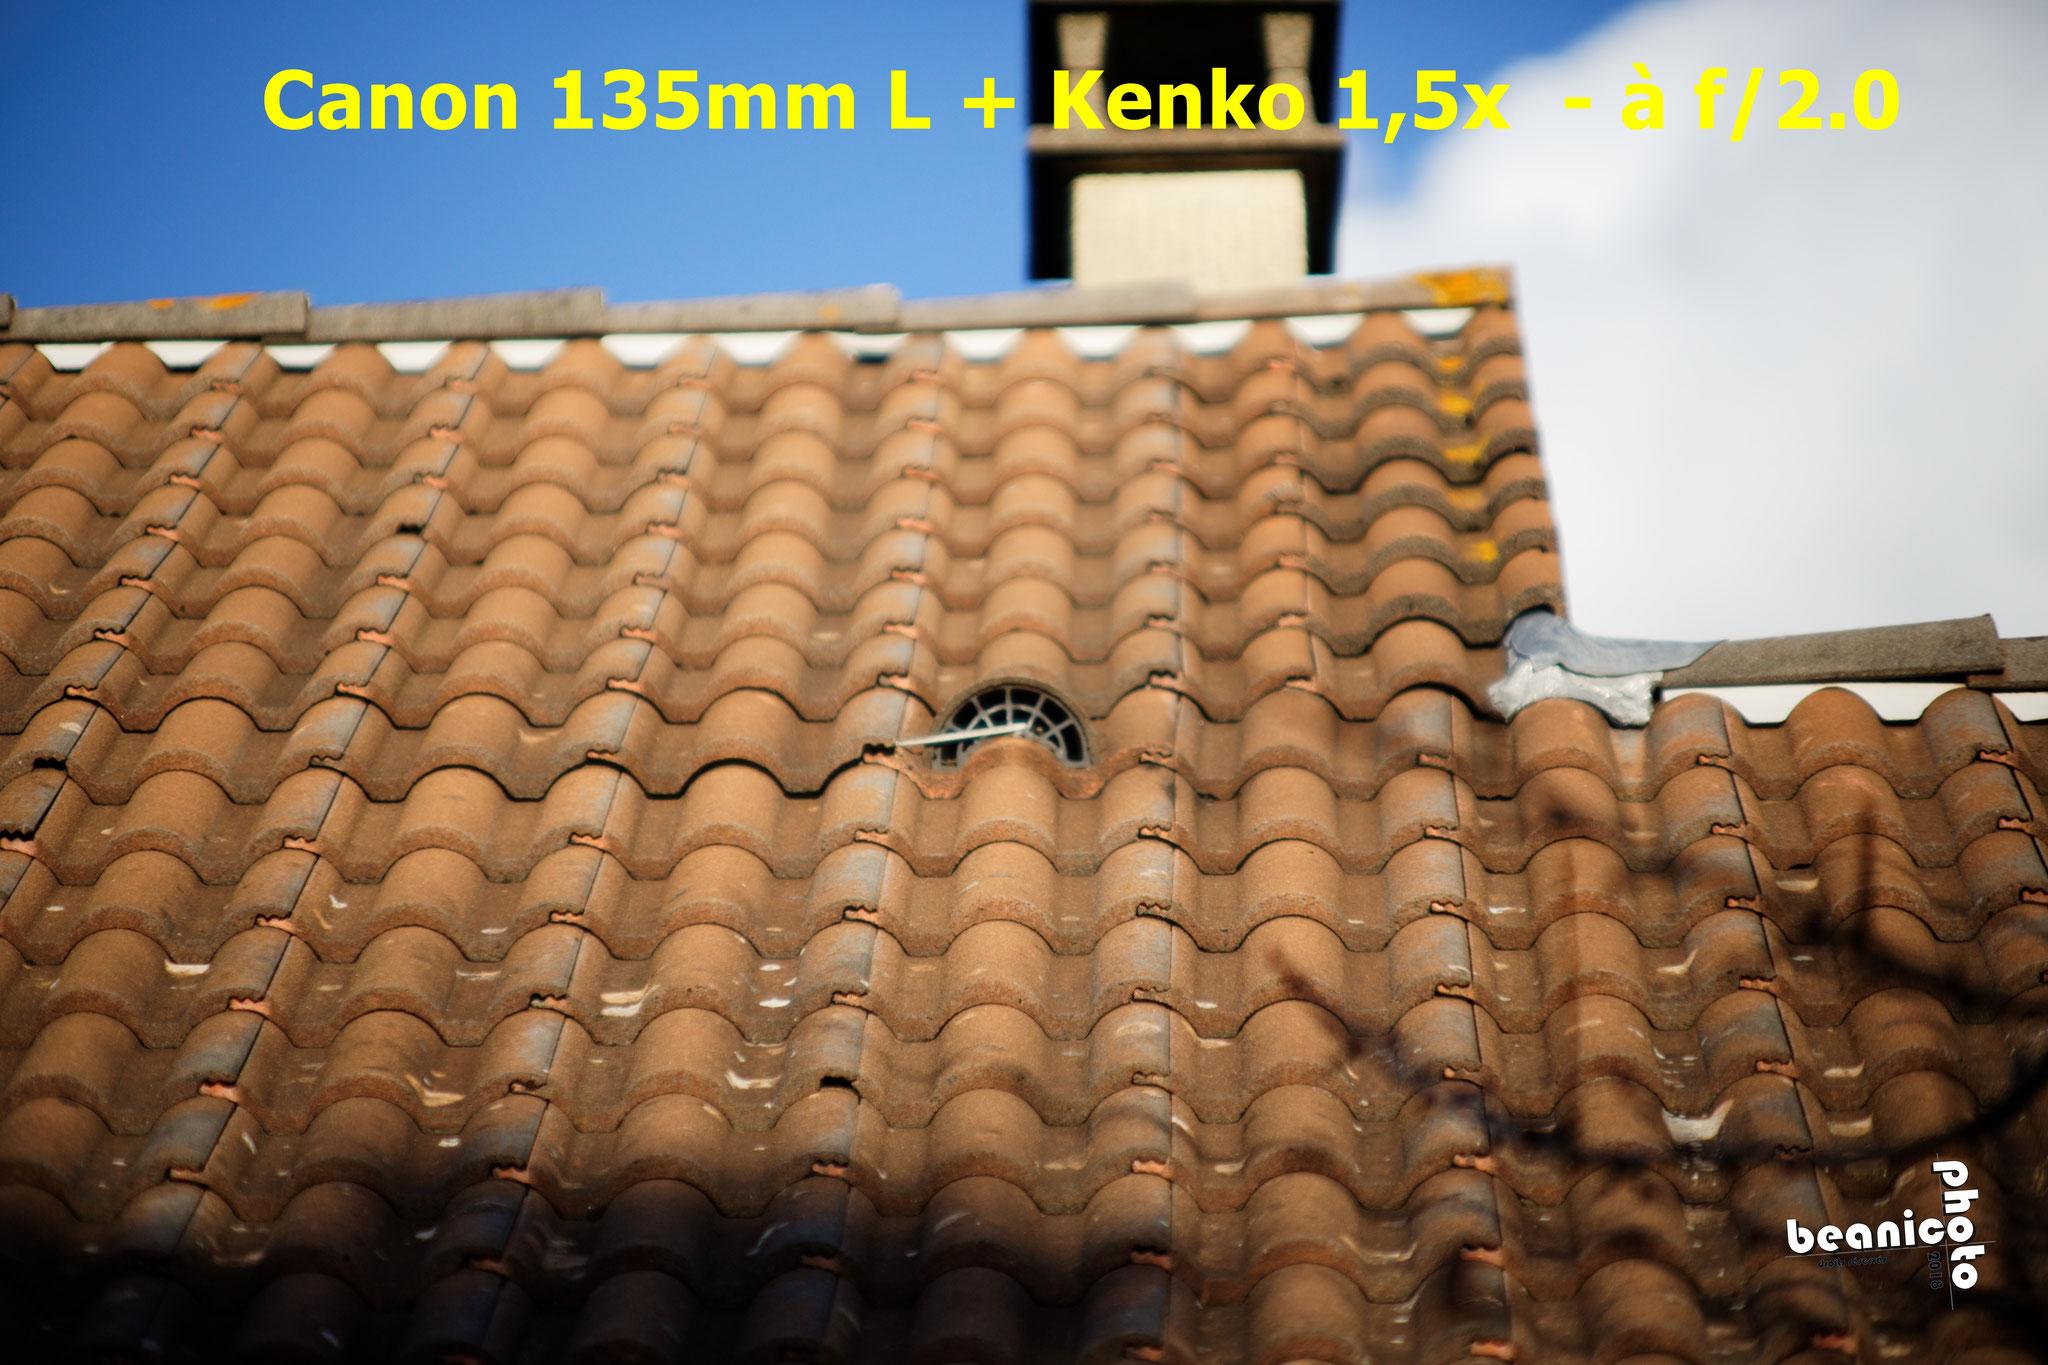 beanico-photo.fr - Canon 5DIII + Canon EF 135mm f/2.0 L USM